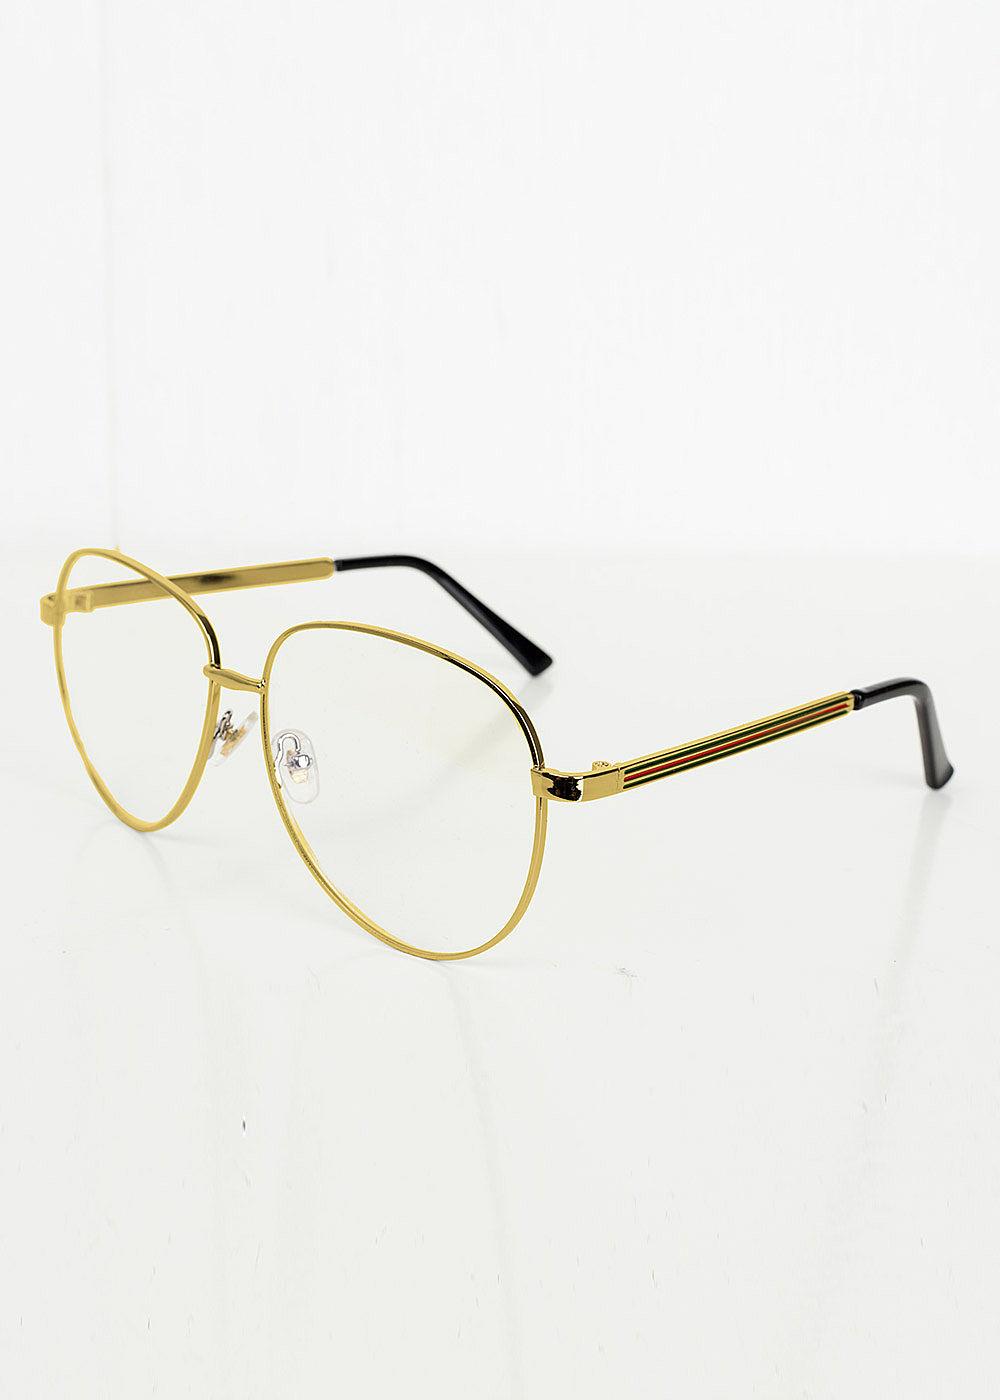 seventyseven lifestyletb damen accessoires brille gold 77onlineshop. Black Bedroom Furniture Sets. Home Design Ideas